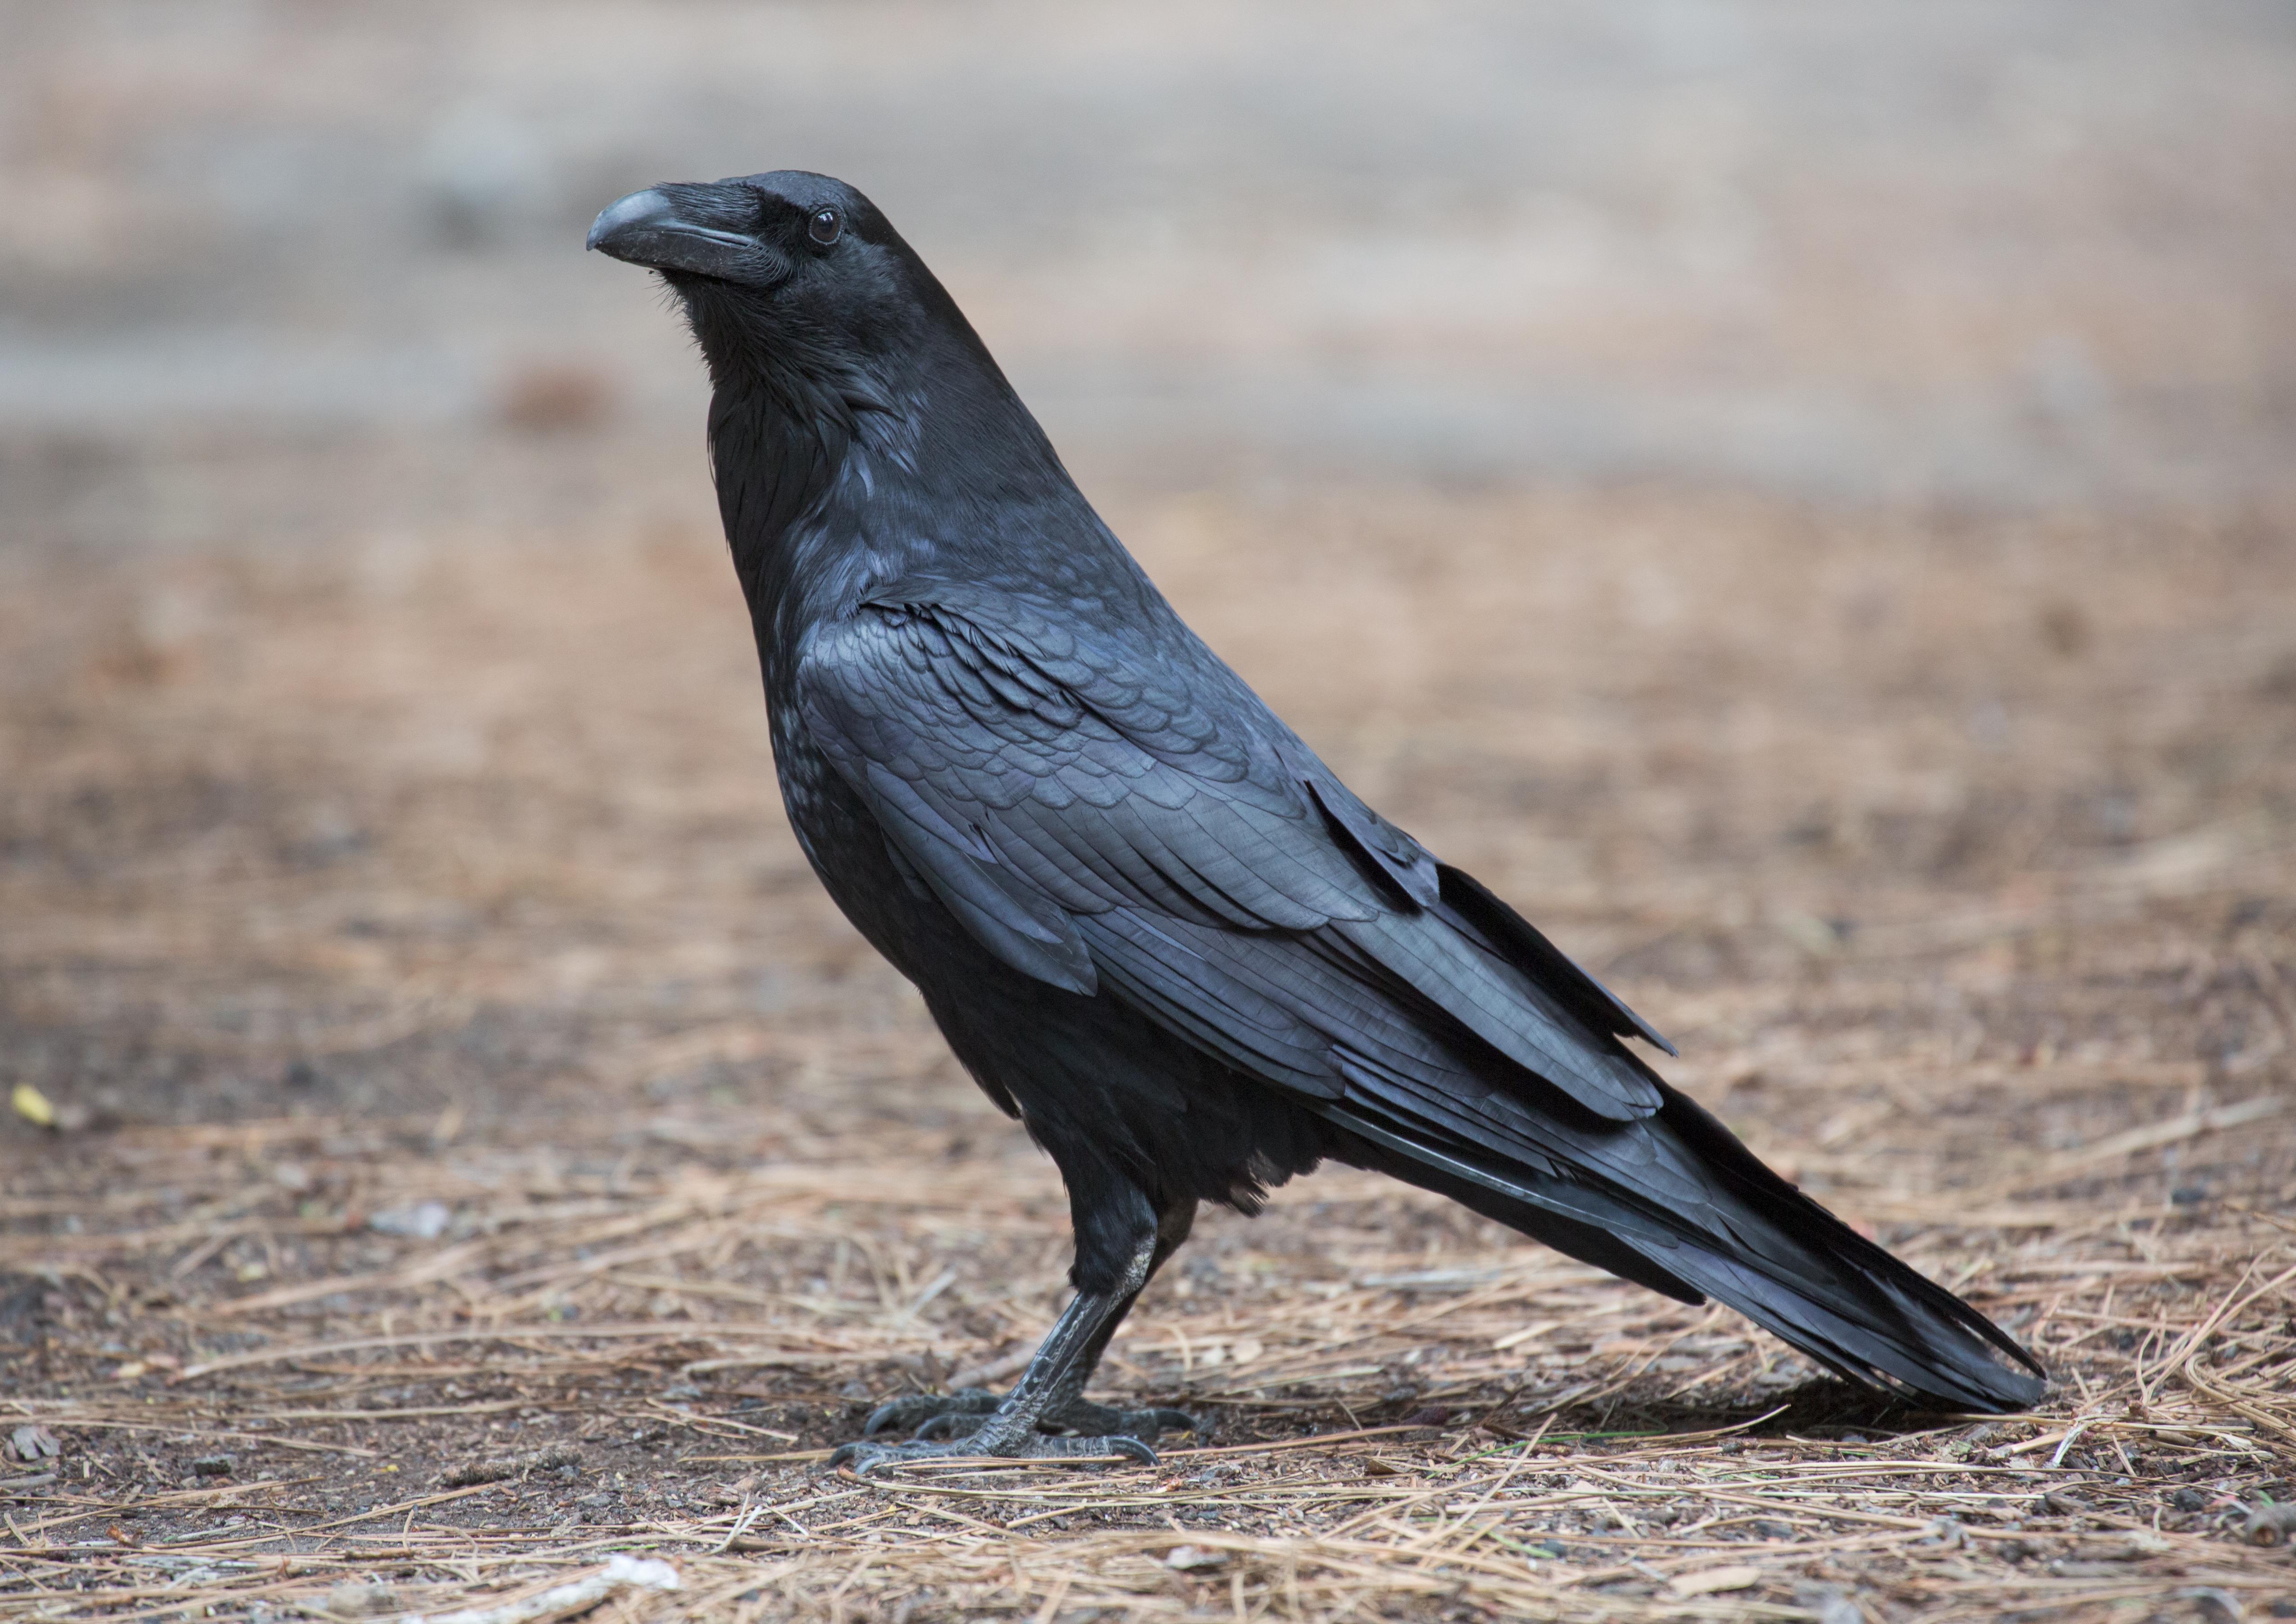 Corvus_corax_%28Common_Raven%29%2C_Yosem